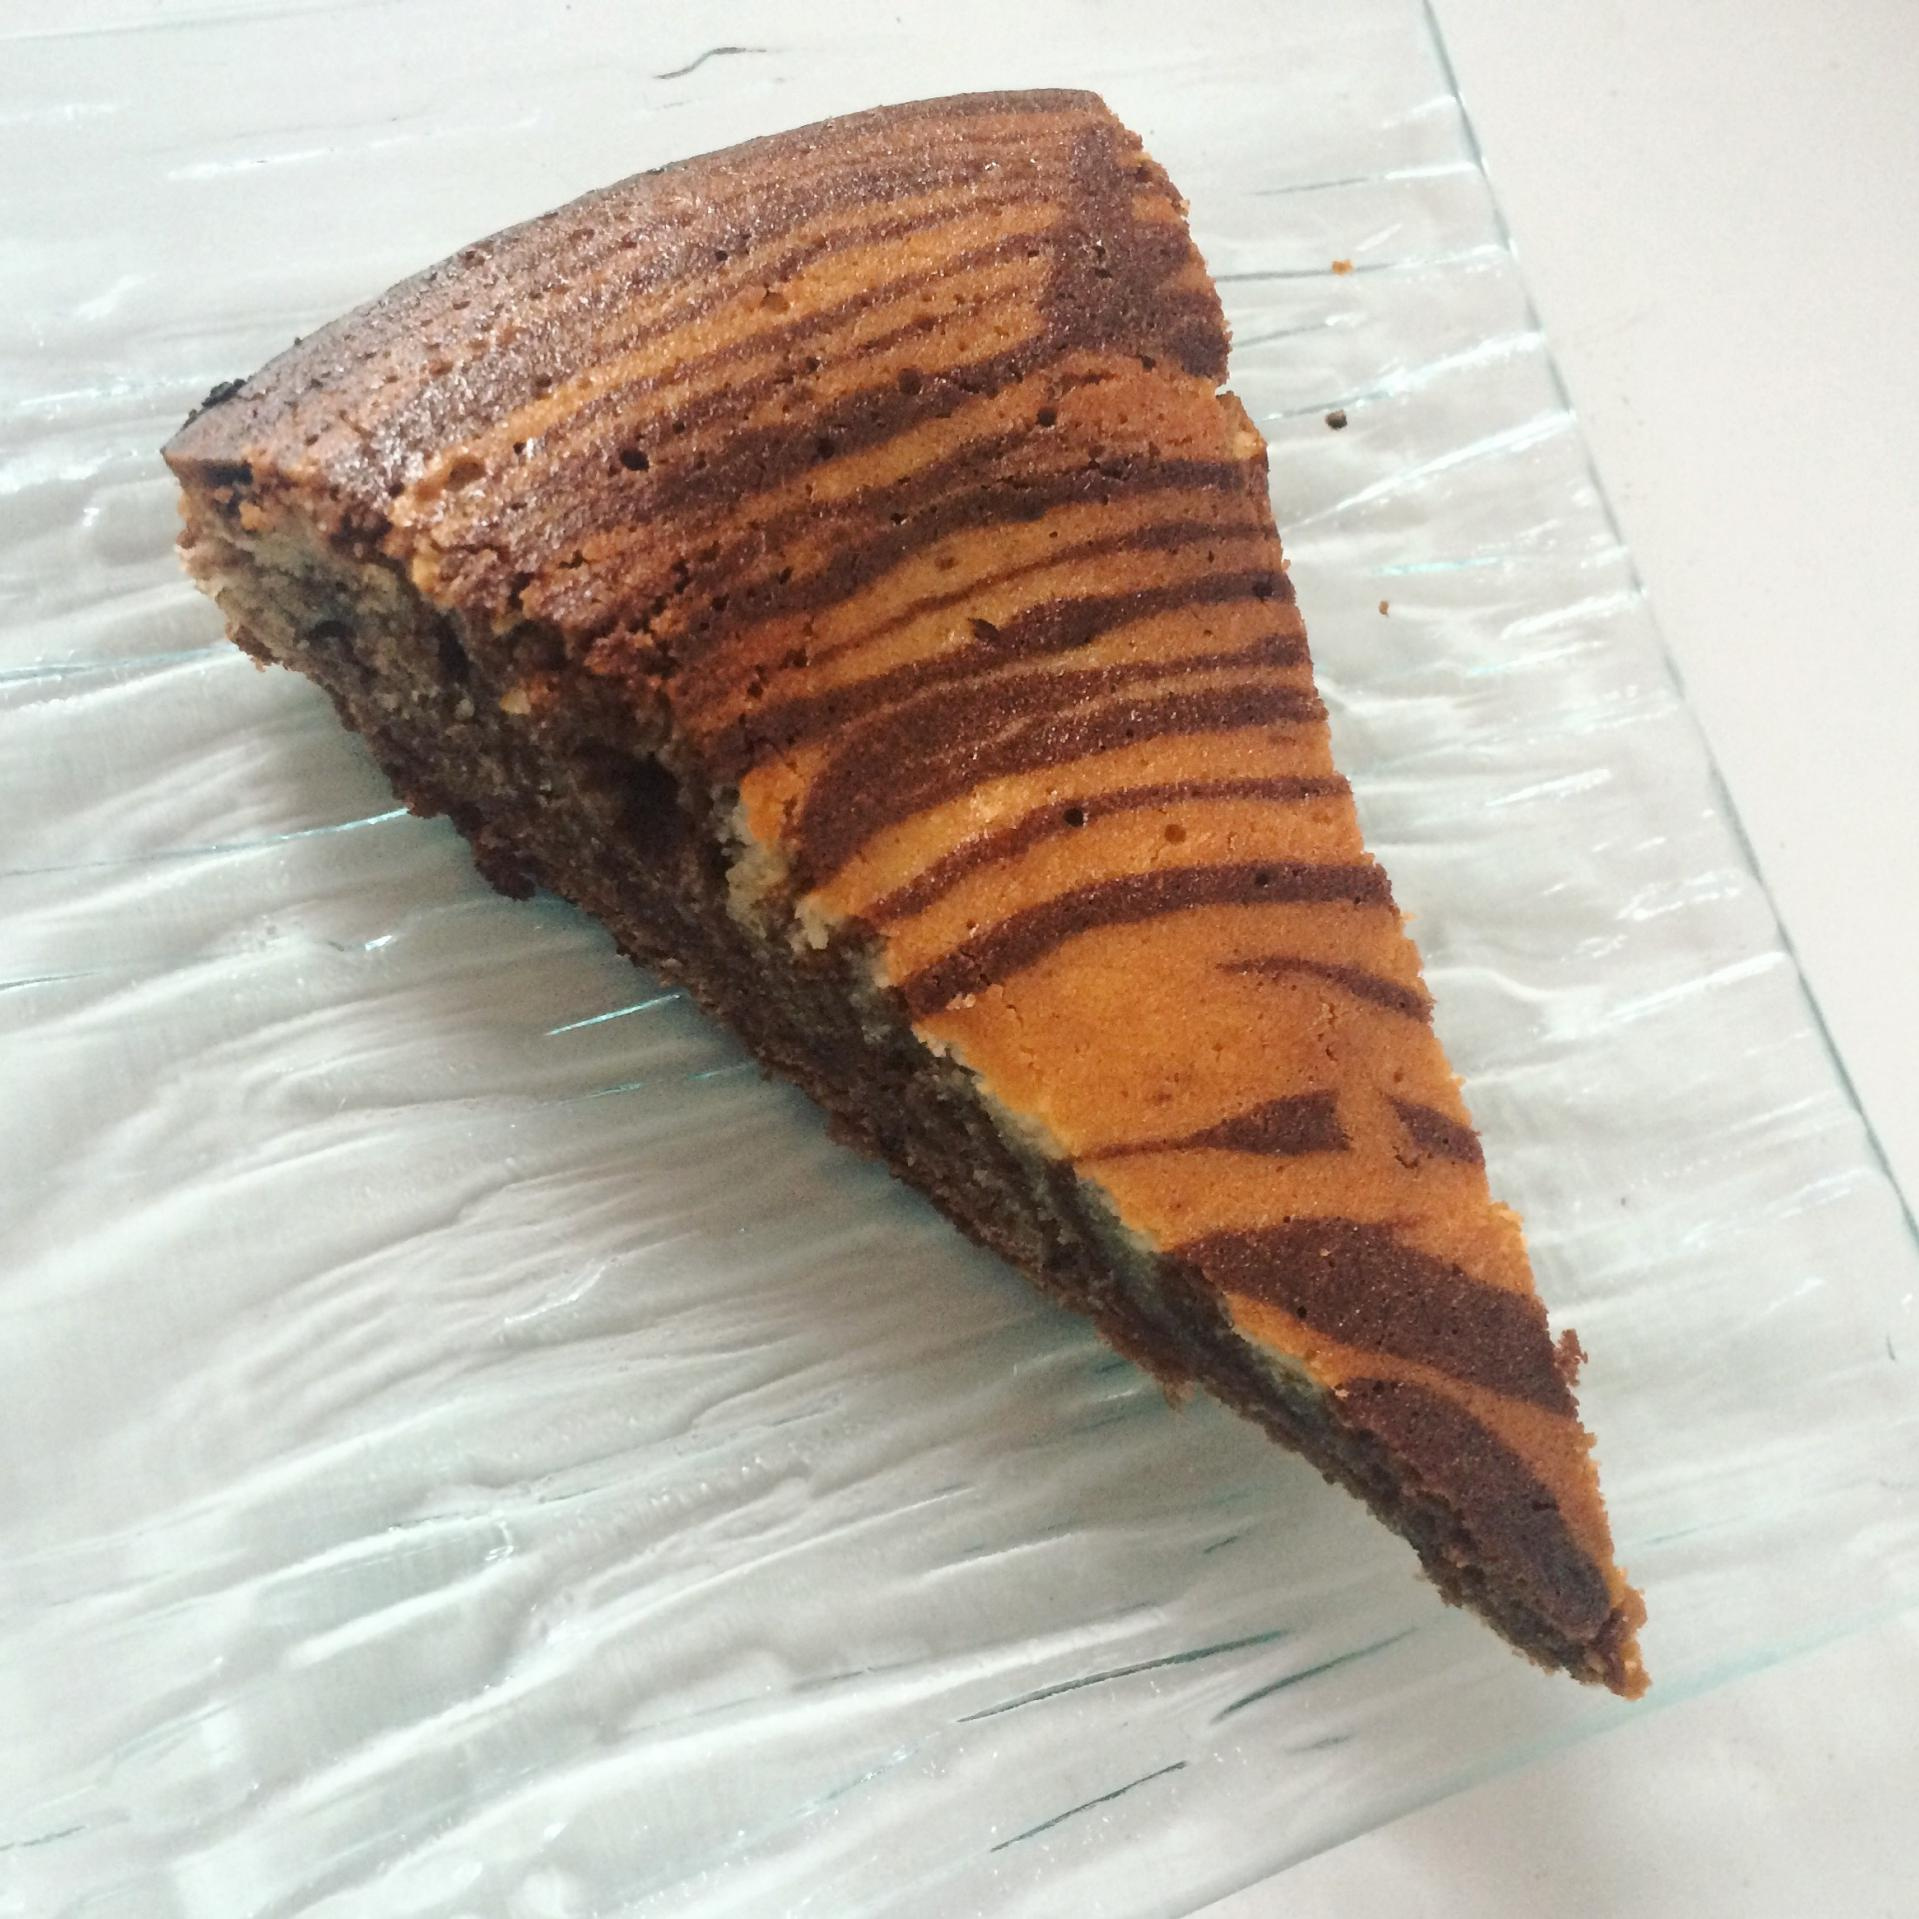 Gateau zébré au chocolat